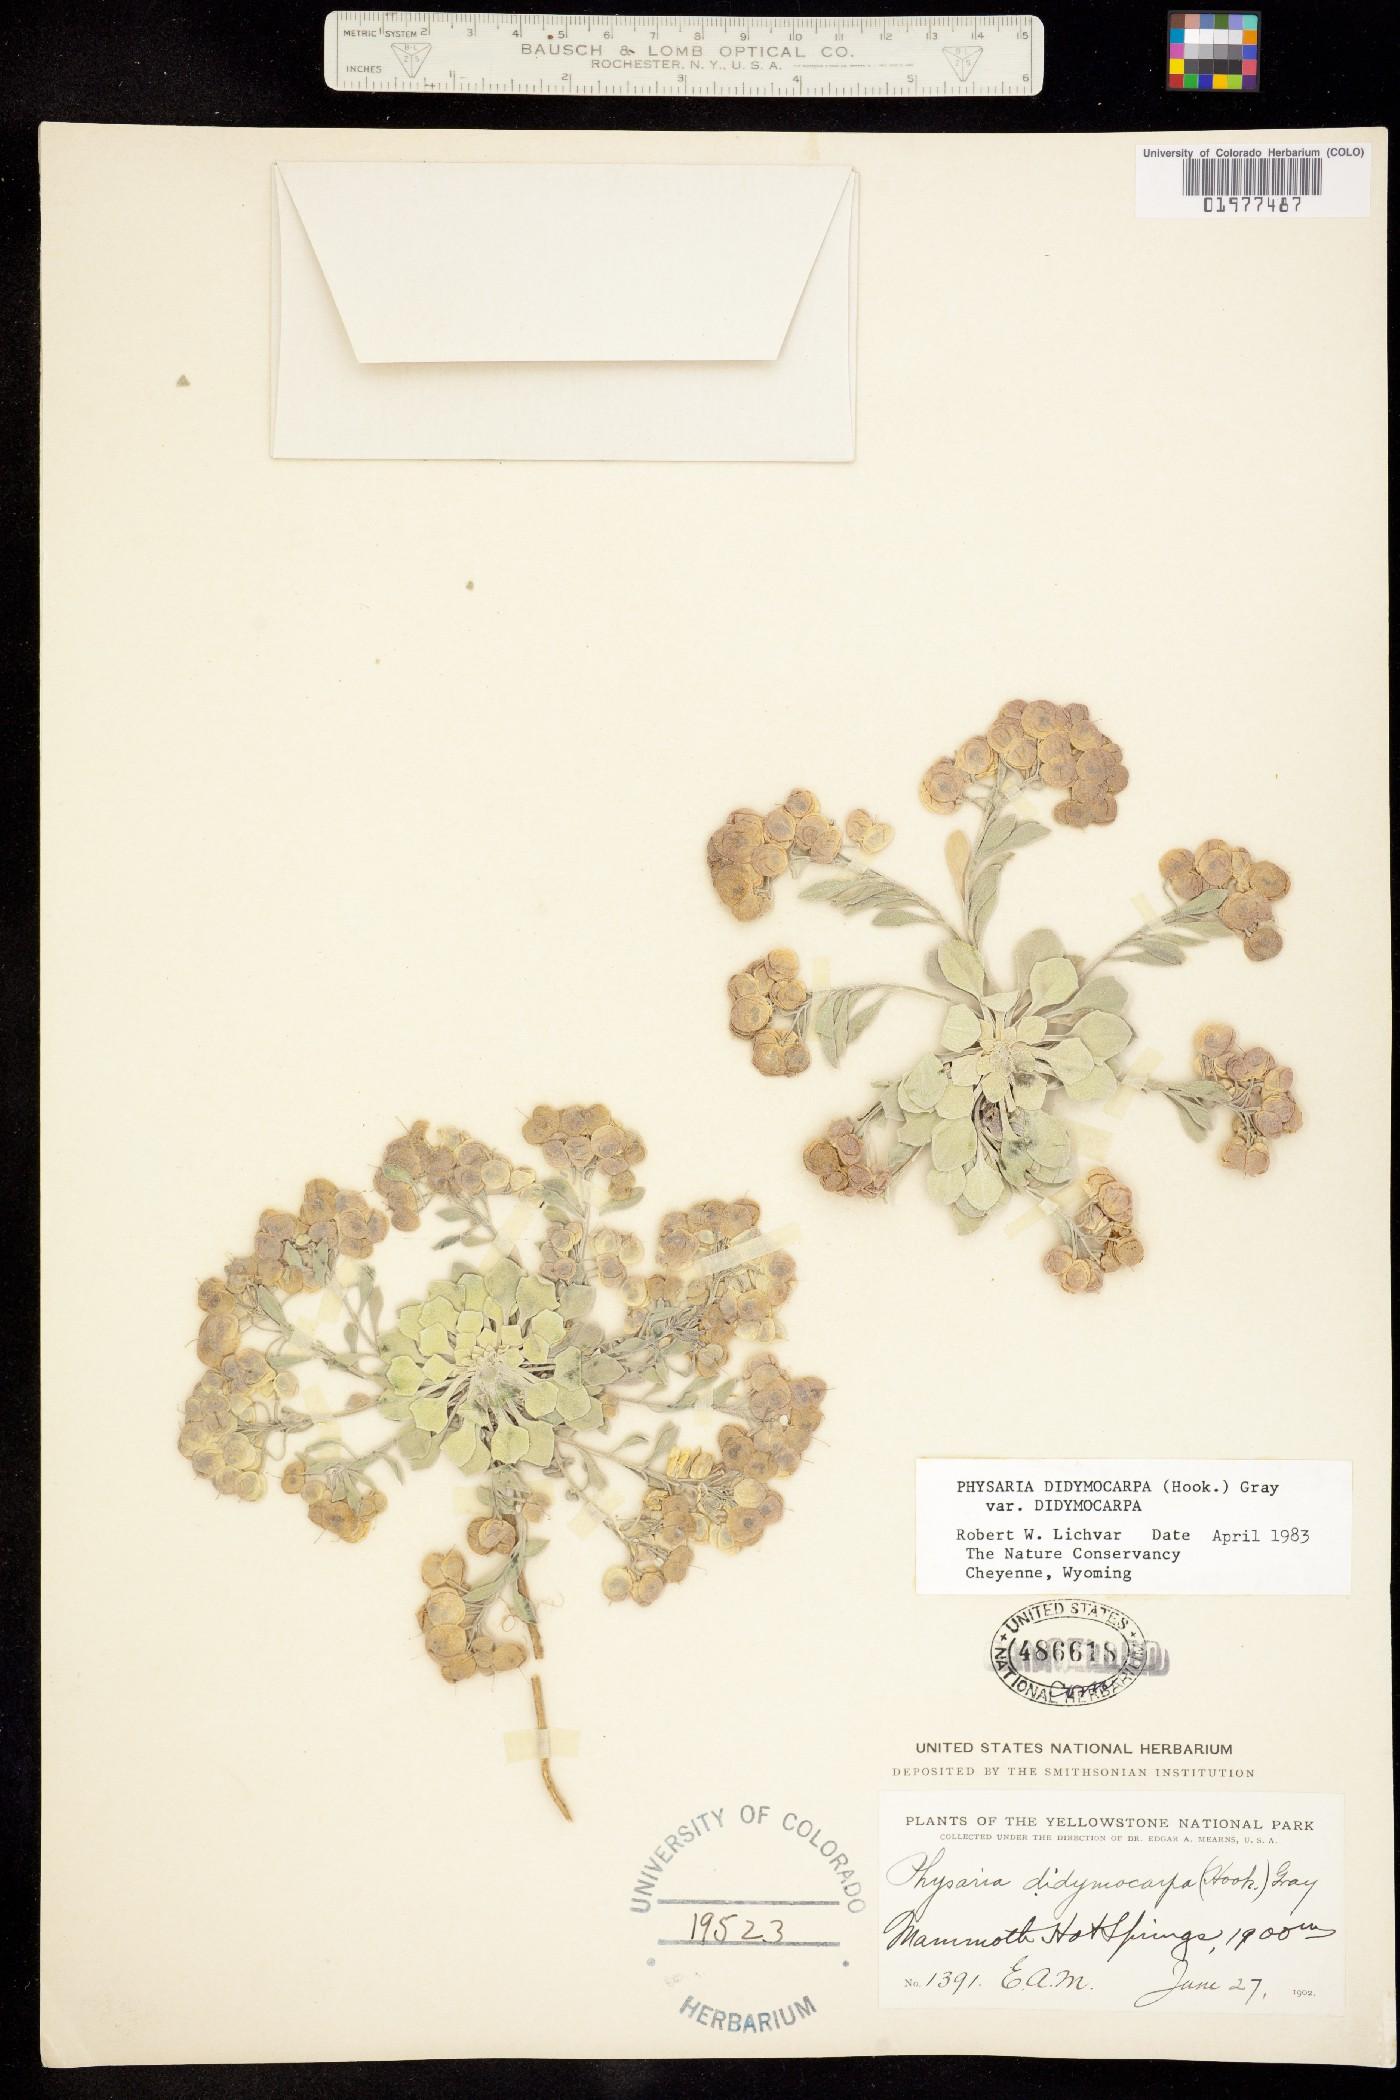 Physaria didymocarpa ssp. didymocarpa image